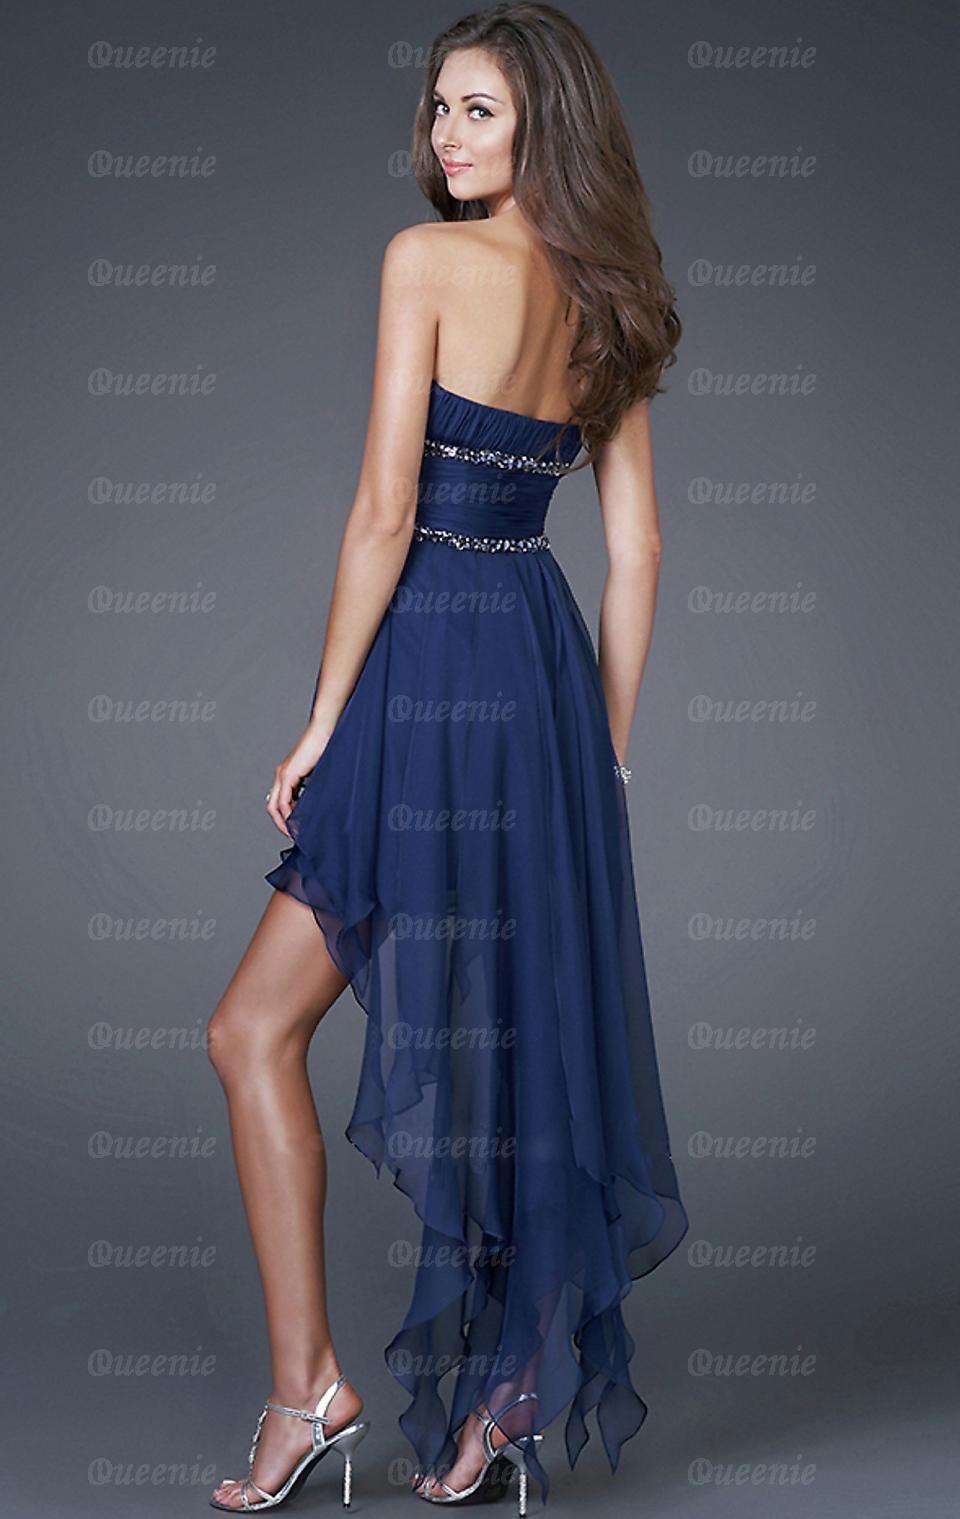 high-low-tencel-a-line-straightstrapless-sleeveless-homecoming-dress-4583-6.jpg 960×1,519 pixels